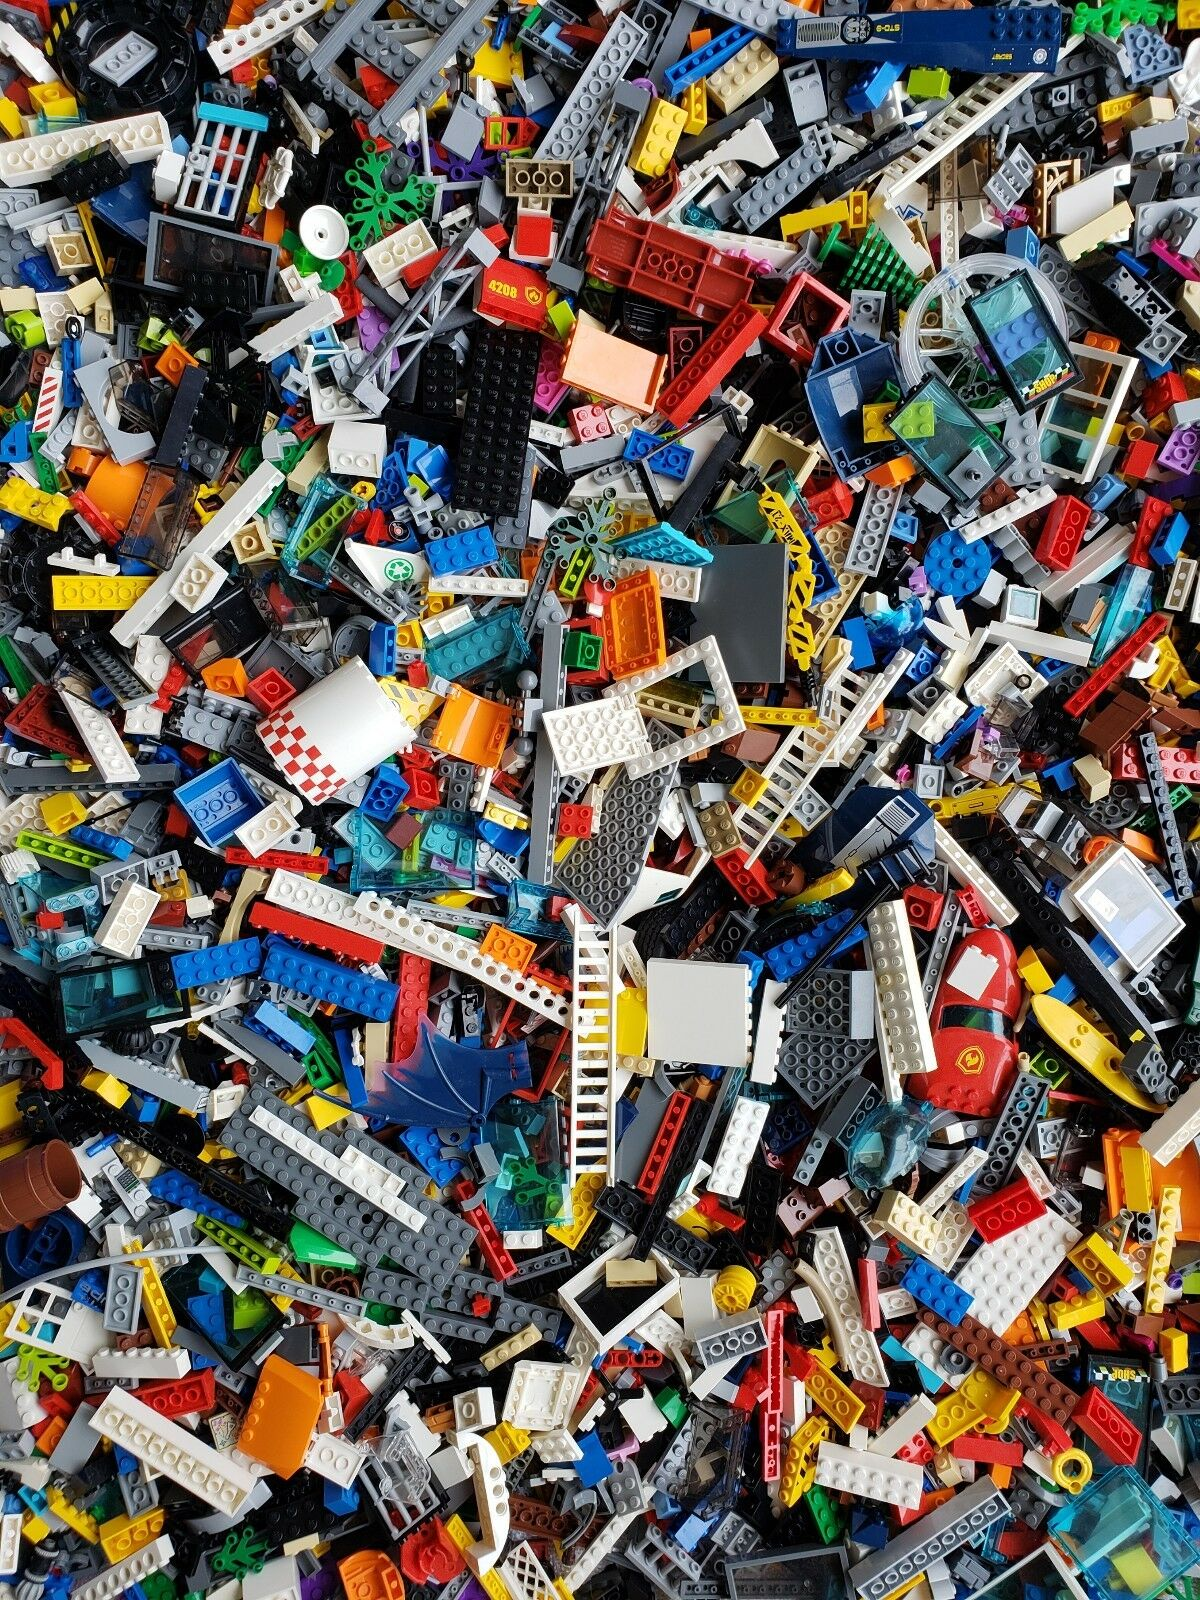 LEGO Lot 6 Pounds Bulk Lot w/ Mini -Figures Cleaned 100% Genuine & Guaranteed